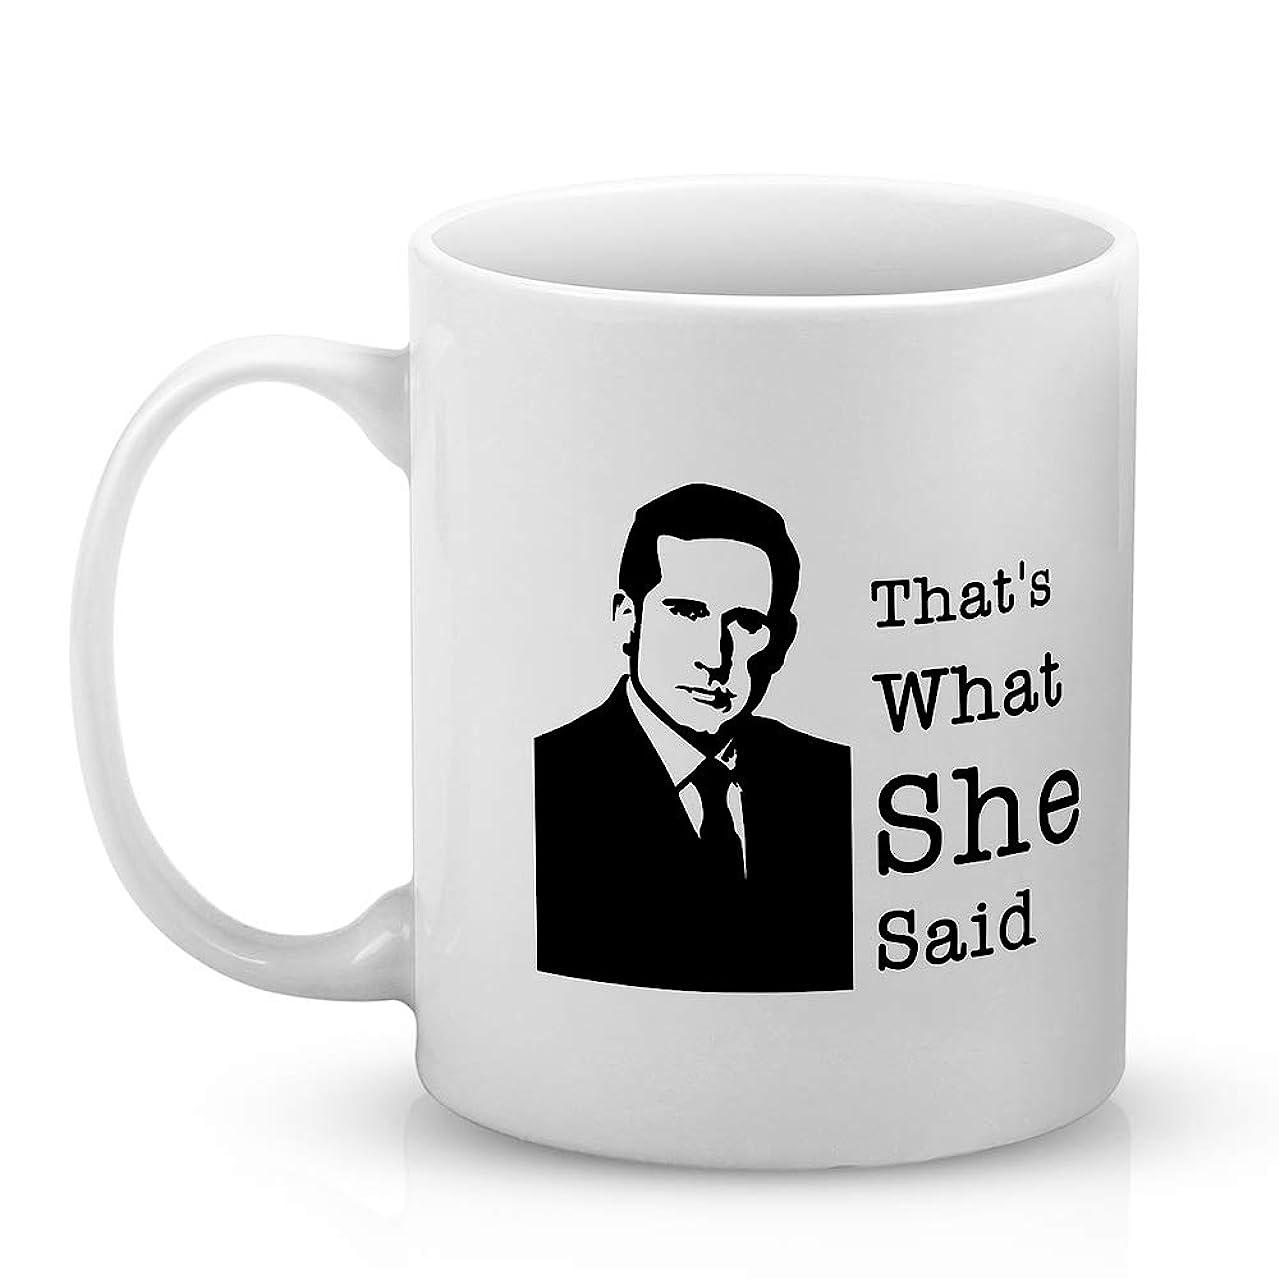 Brital Office That's What She Said Boss Funny Coffee Mug Gag Gift 11 Ounces